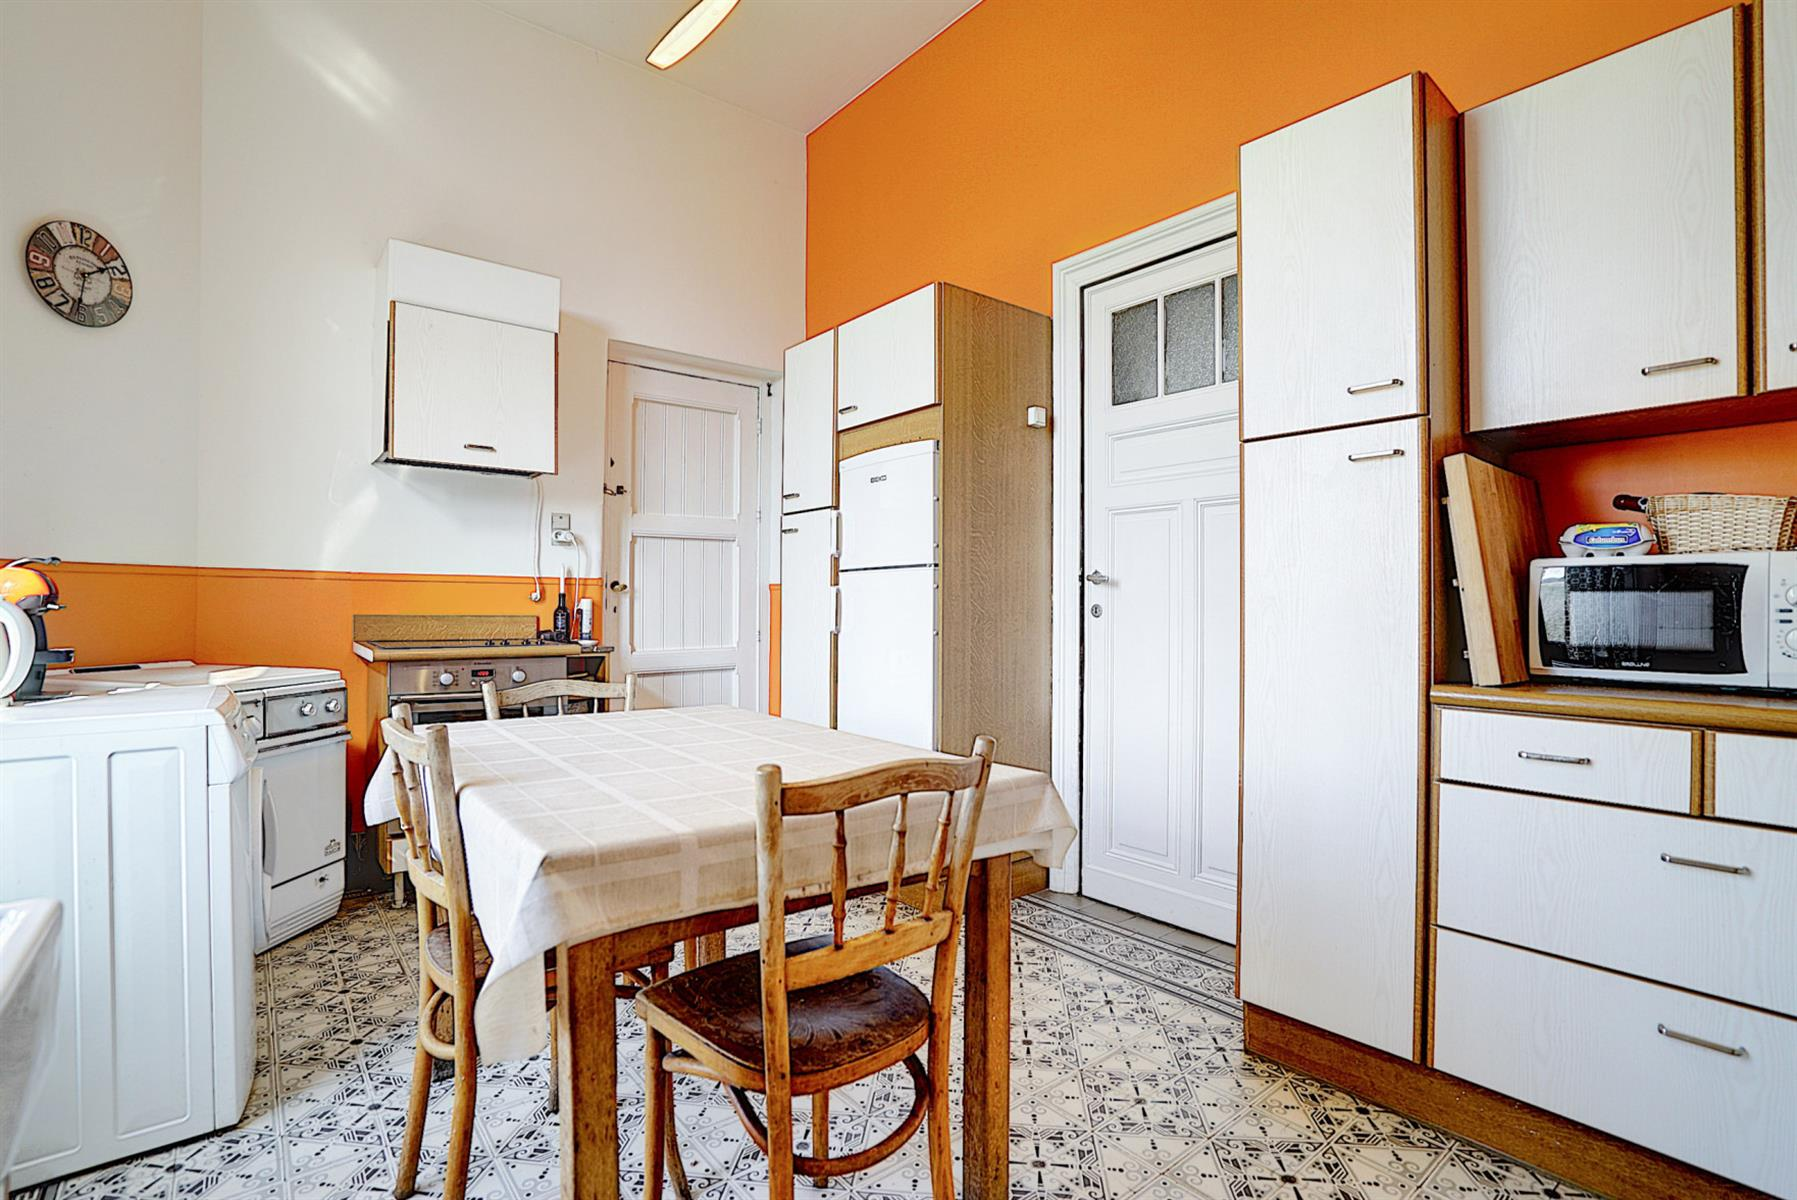 Maison - Hévillers - #4308127-9